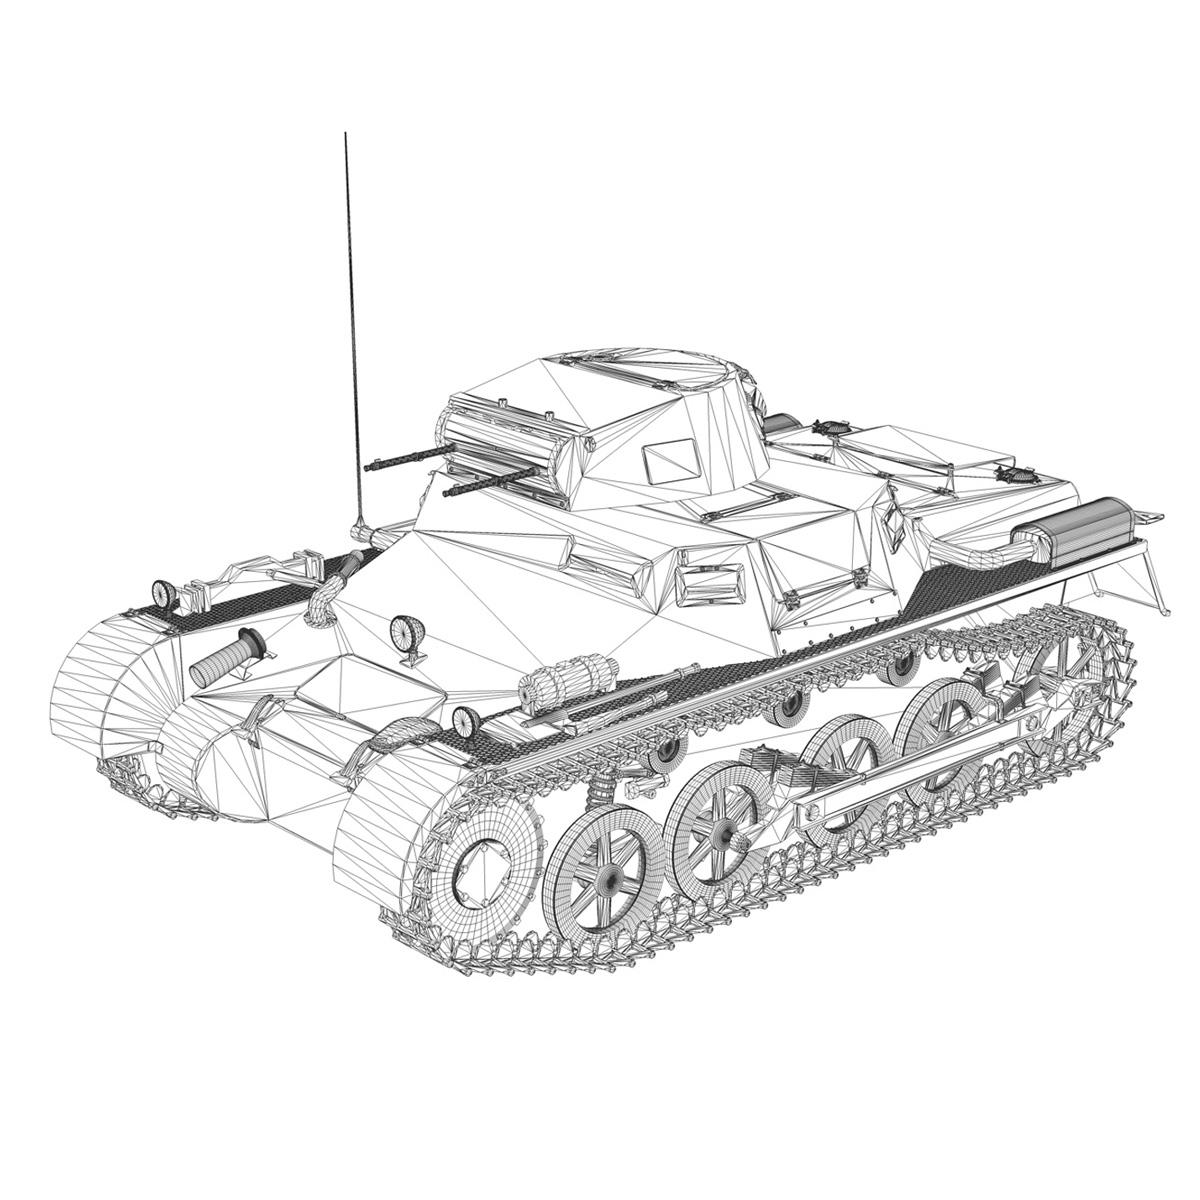 pzkpfw 1 - Panzer 1 - ausf. a - 22 3d modell 3ds fbx c4d lwo obj 186935